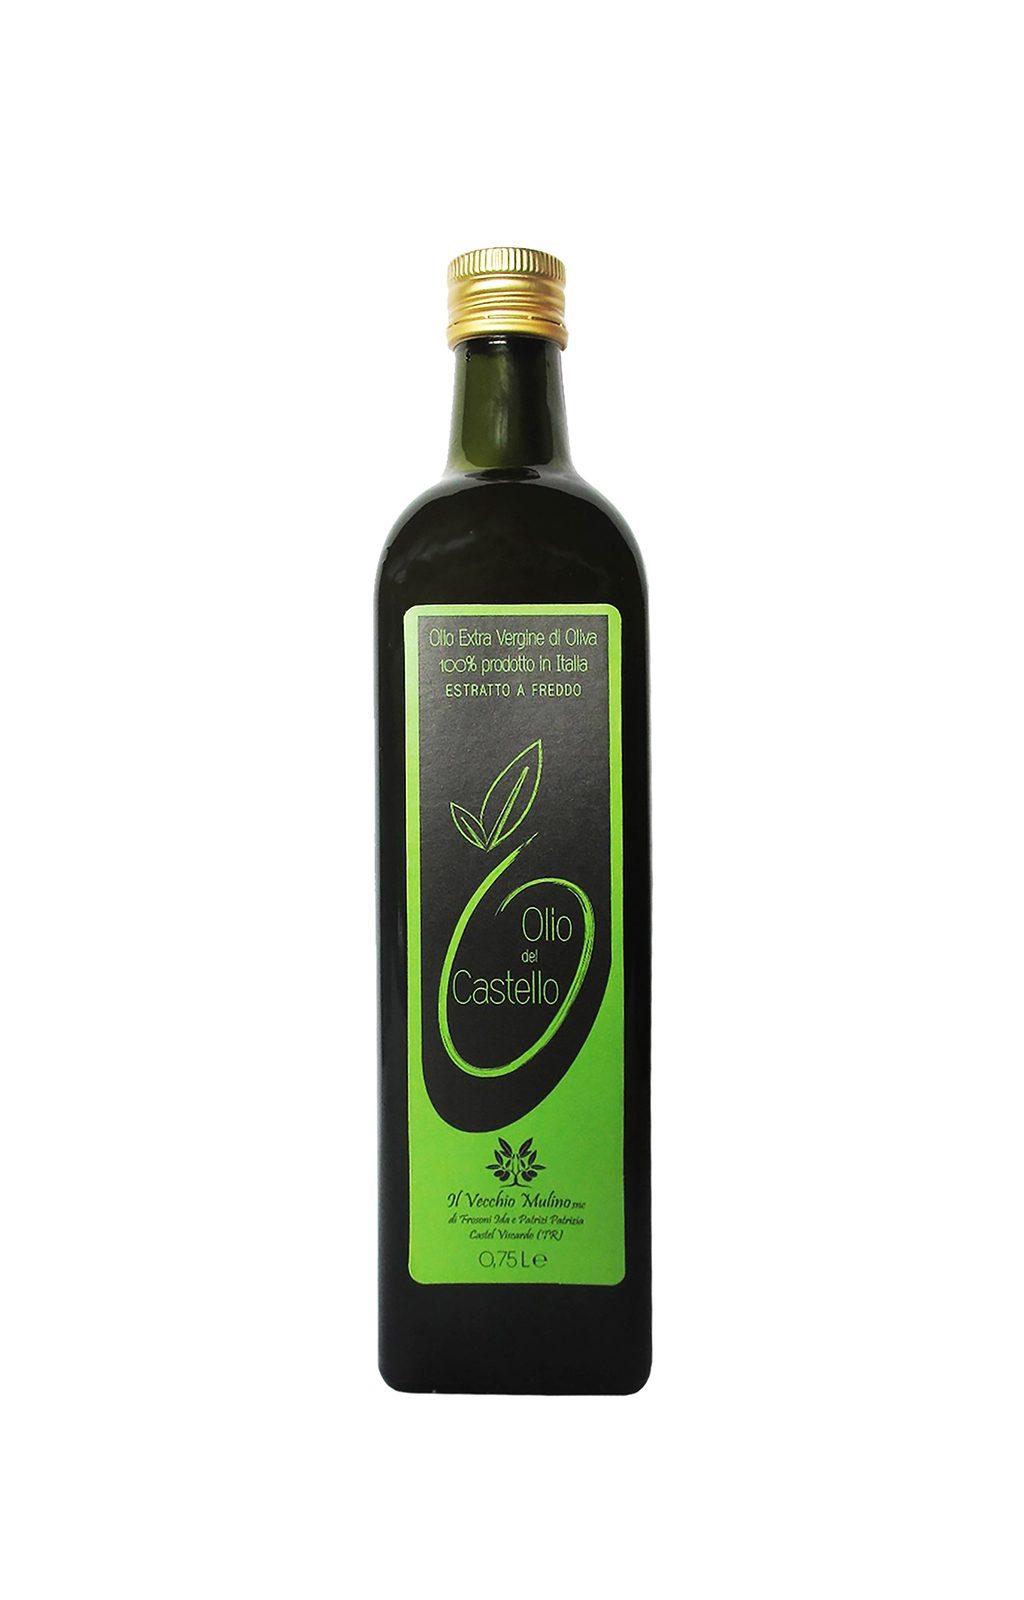 Olio Extravergine di Oliva Bottiglia 0.75L, bottiglia olio extravergine di oliva